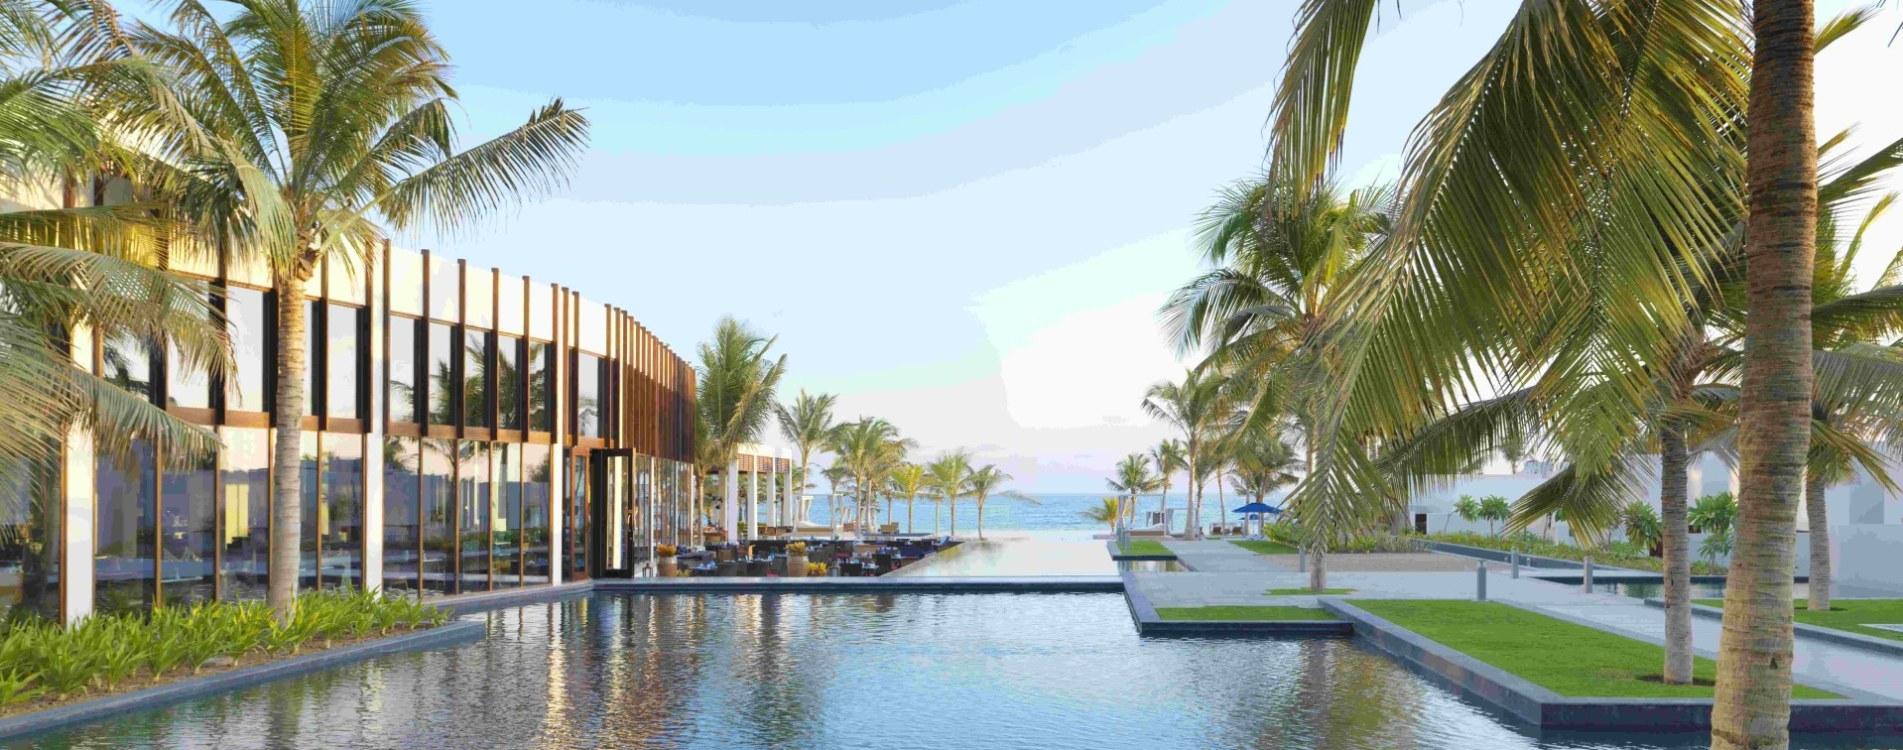 Al-Baleed-Resort-Salalah-By-Anantara-Sakalan-Restaurant-Exterior-Pool.jpg